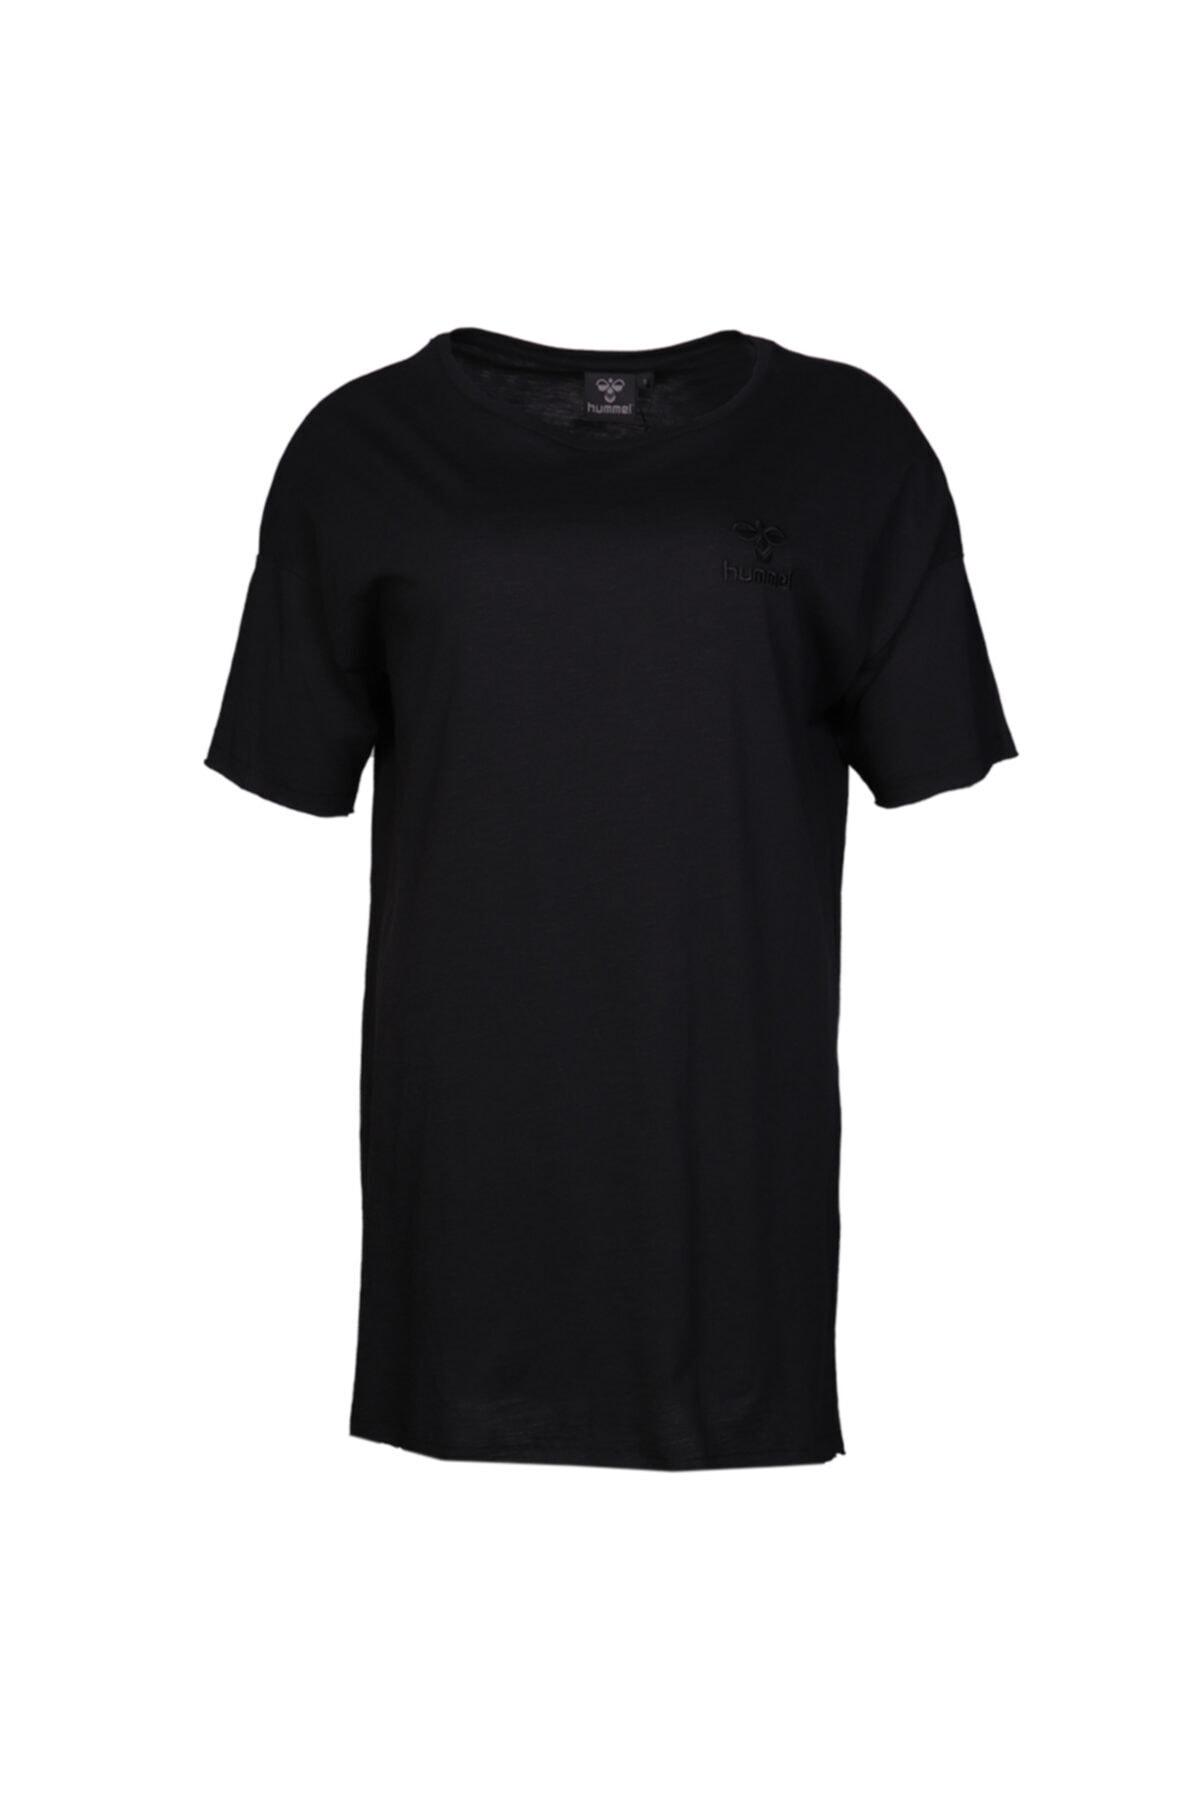 HUMMEL Alıce Kısa Kollu Tişört 2